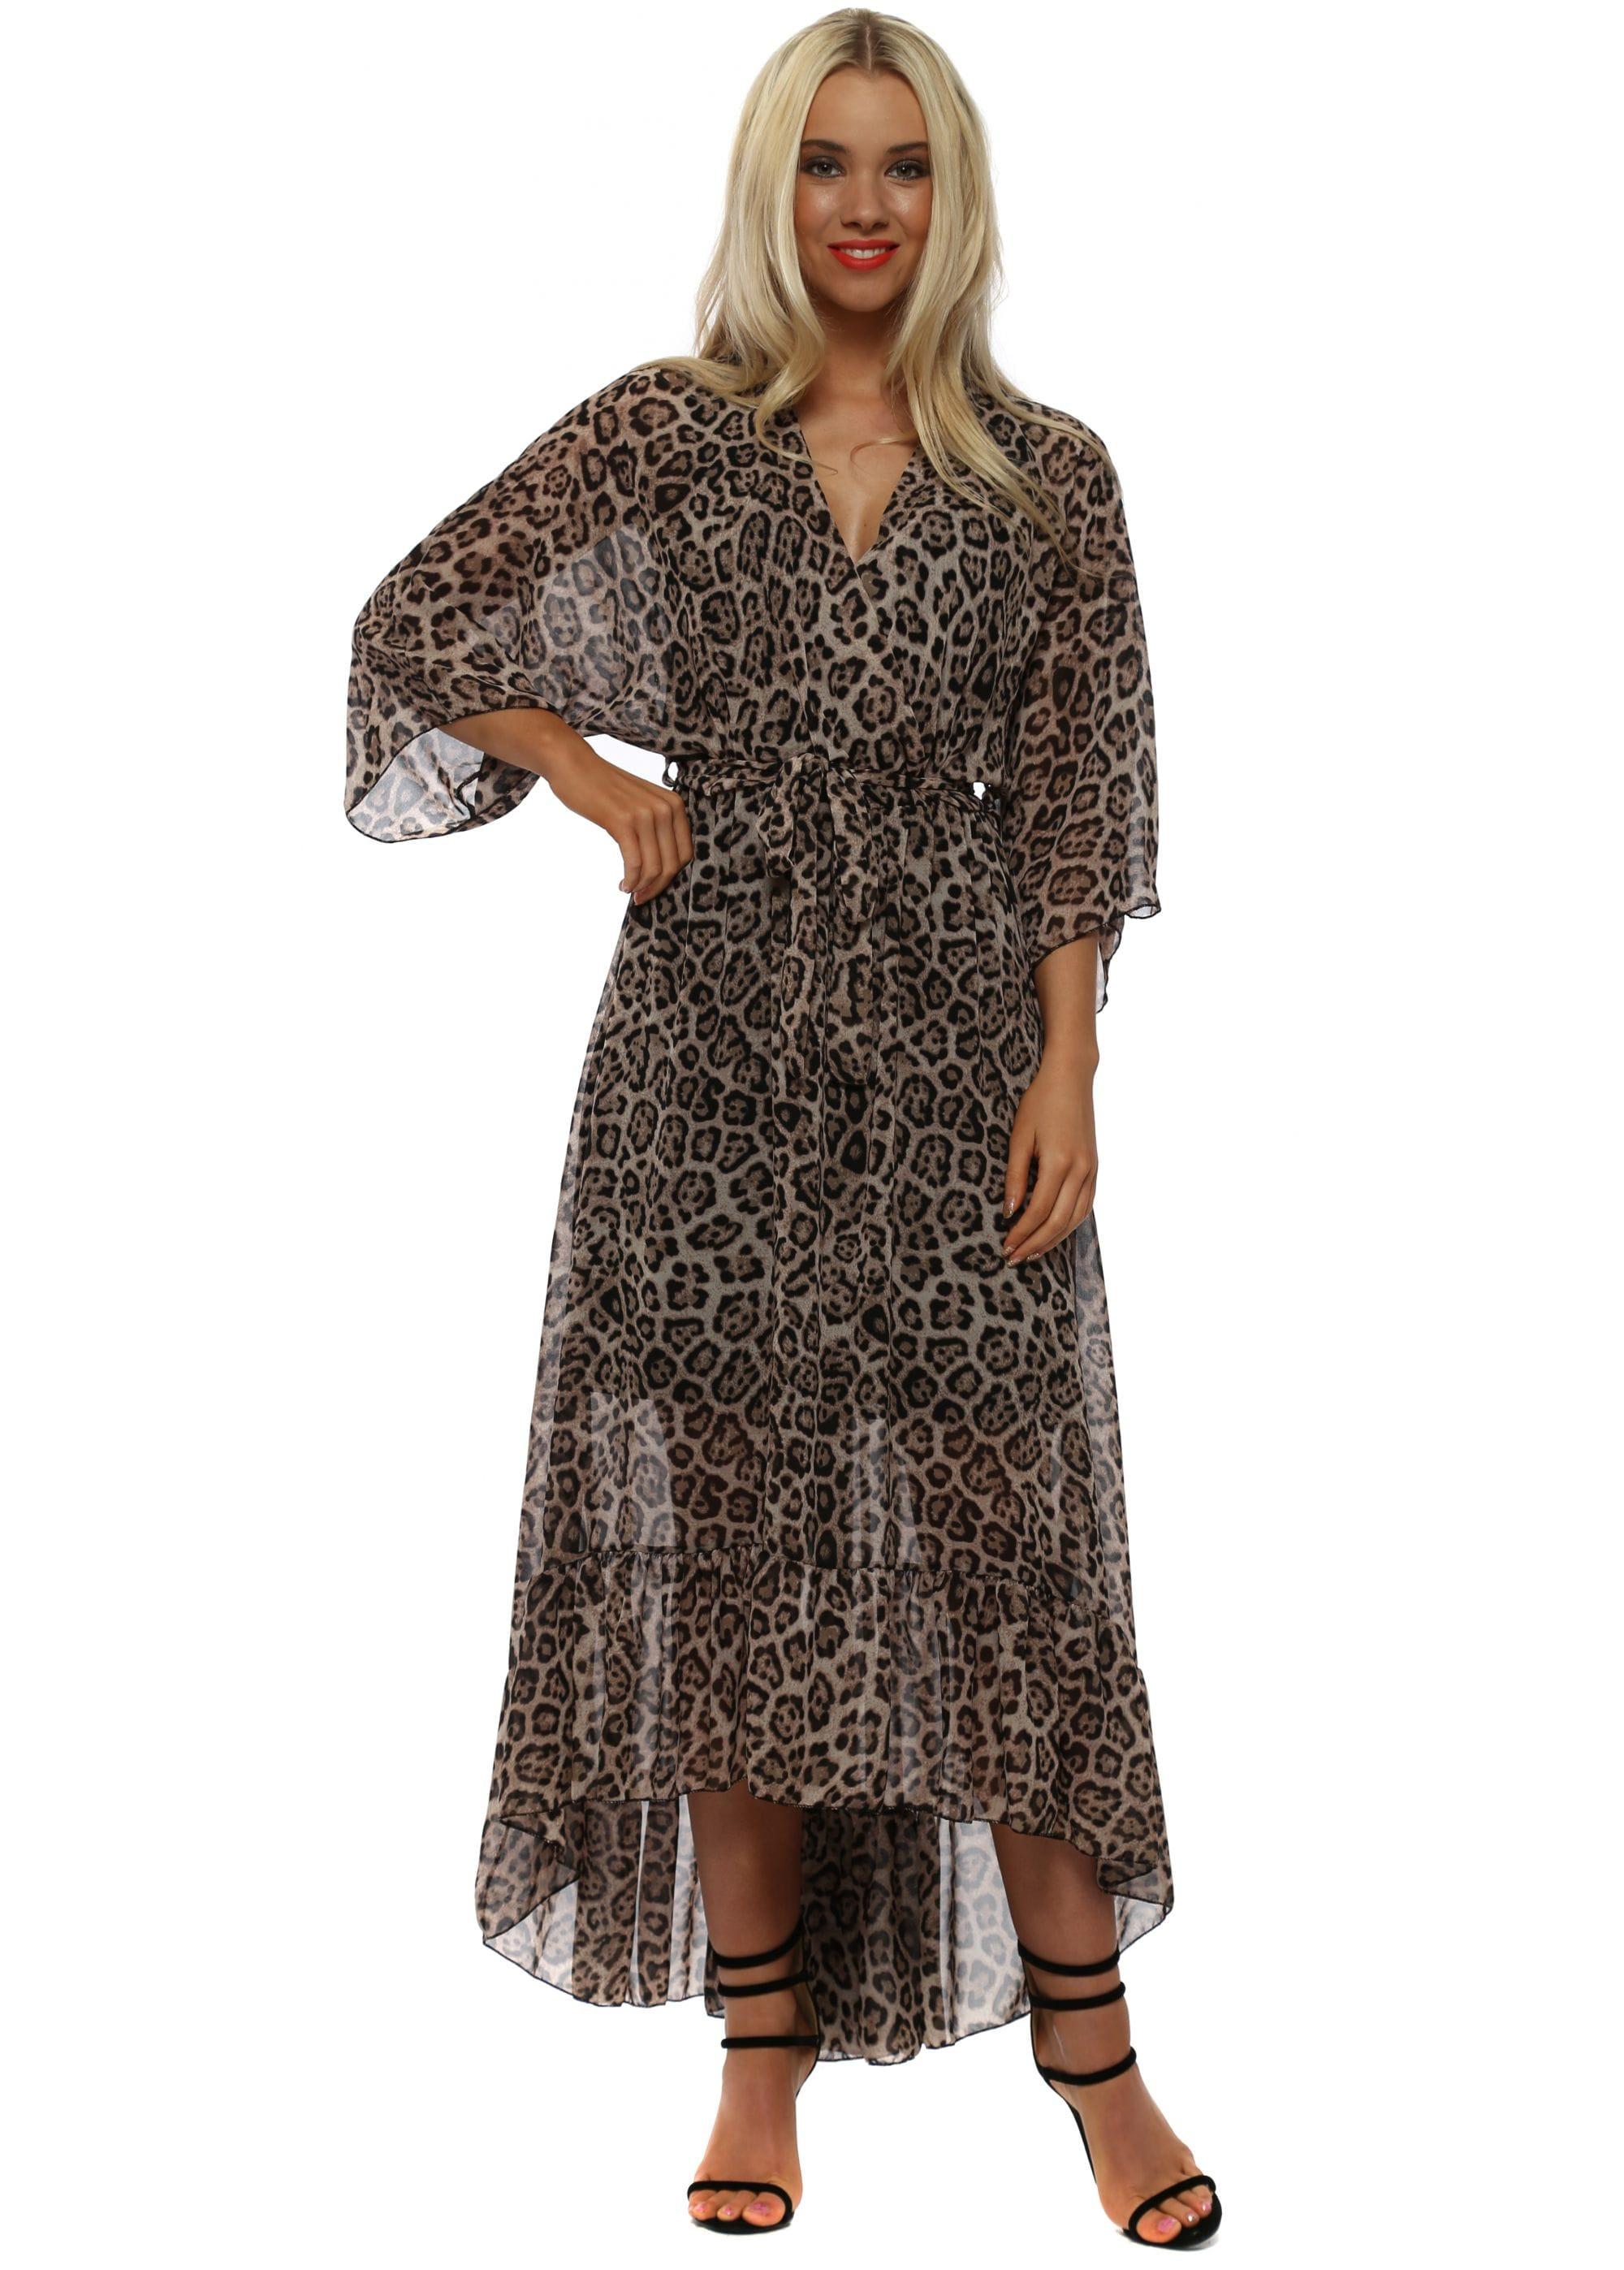 e89683f28494 Mocha Cheetah Print Chiffon High Low Dress